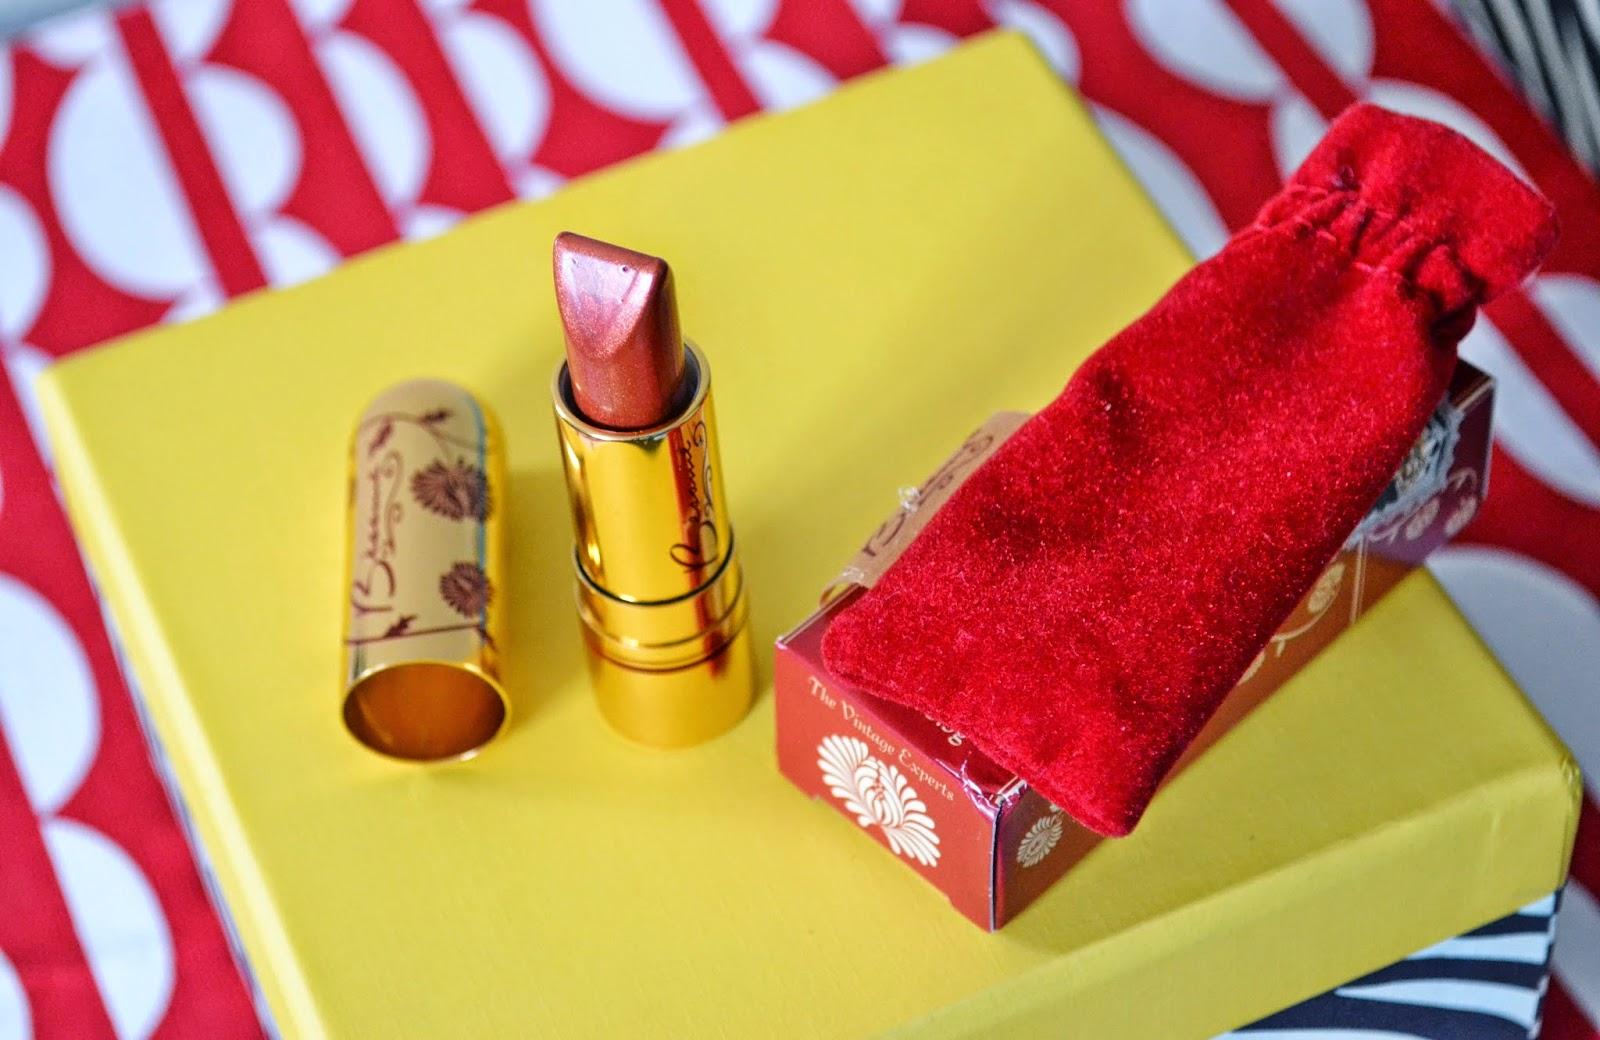 Besame Cosmetics lipstick in Coral - Aspiring Londoner